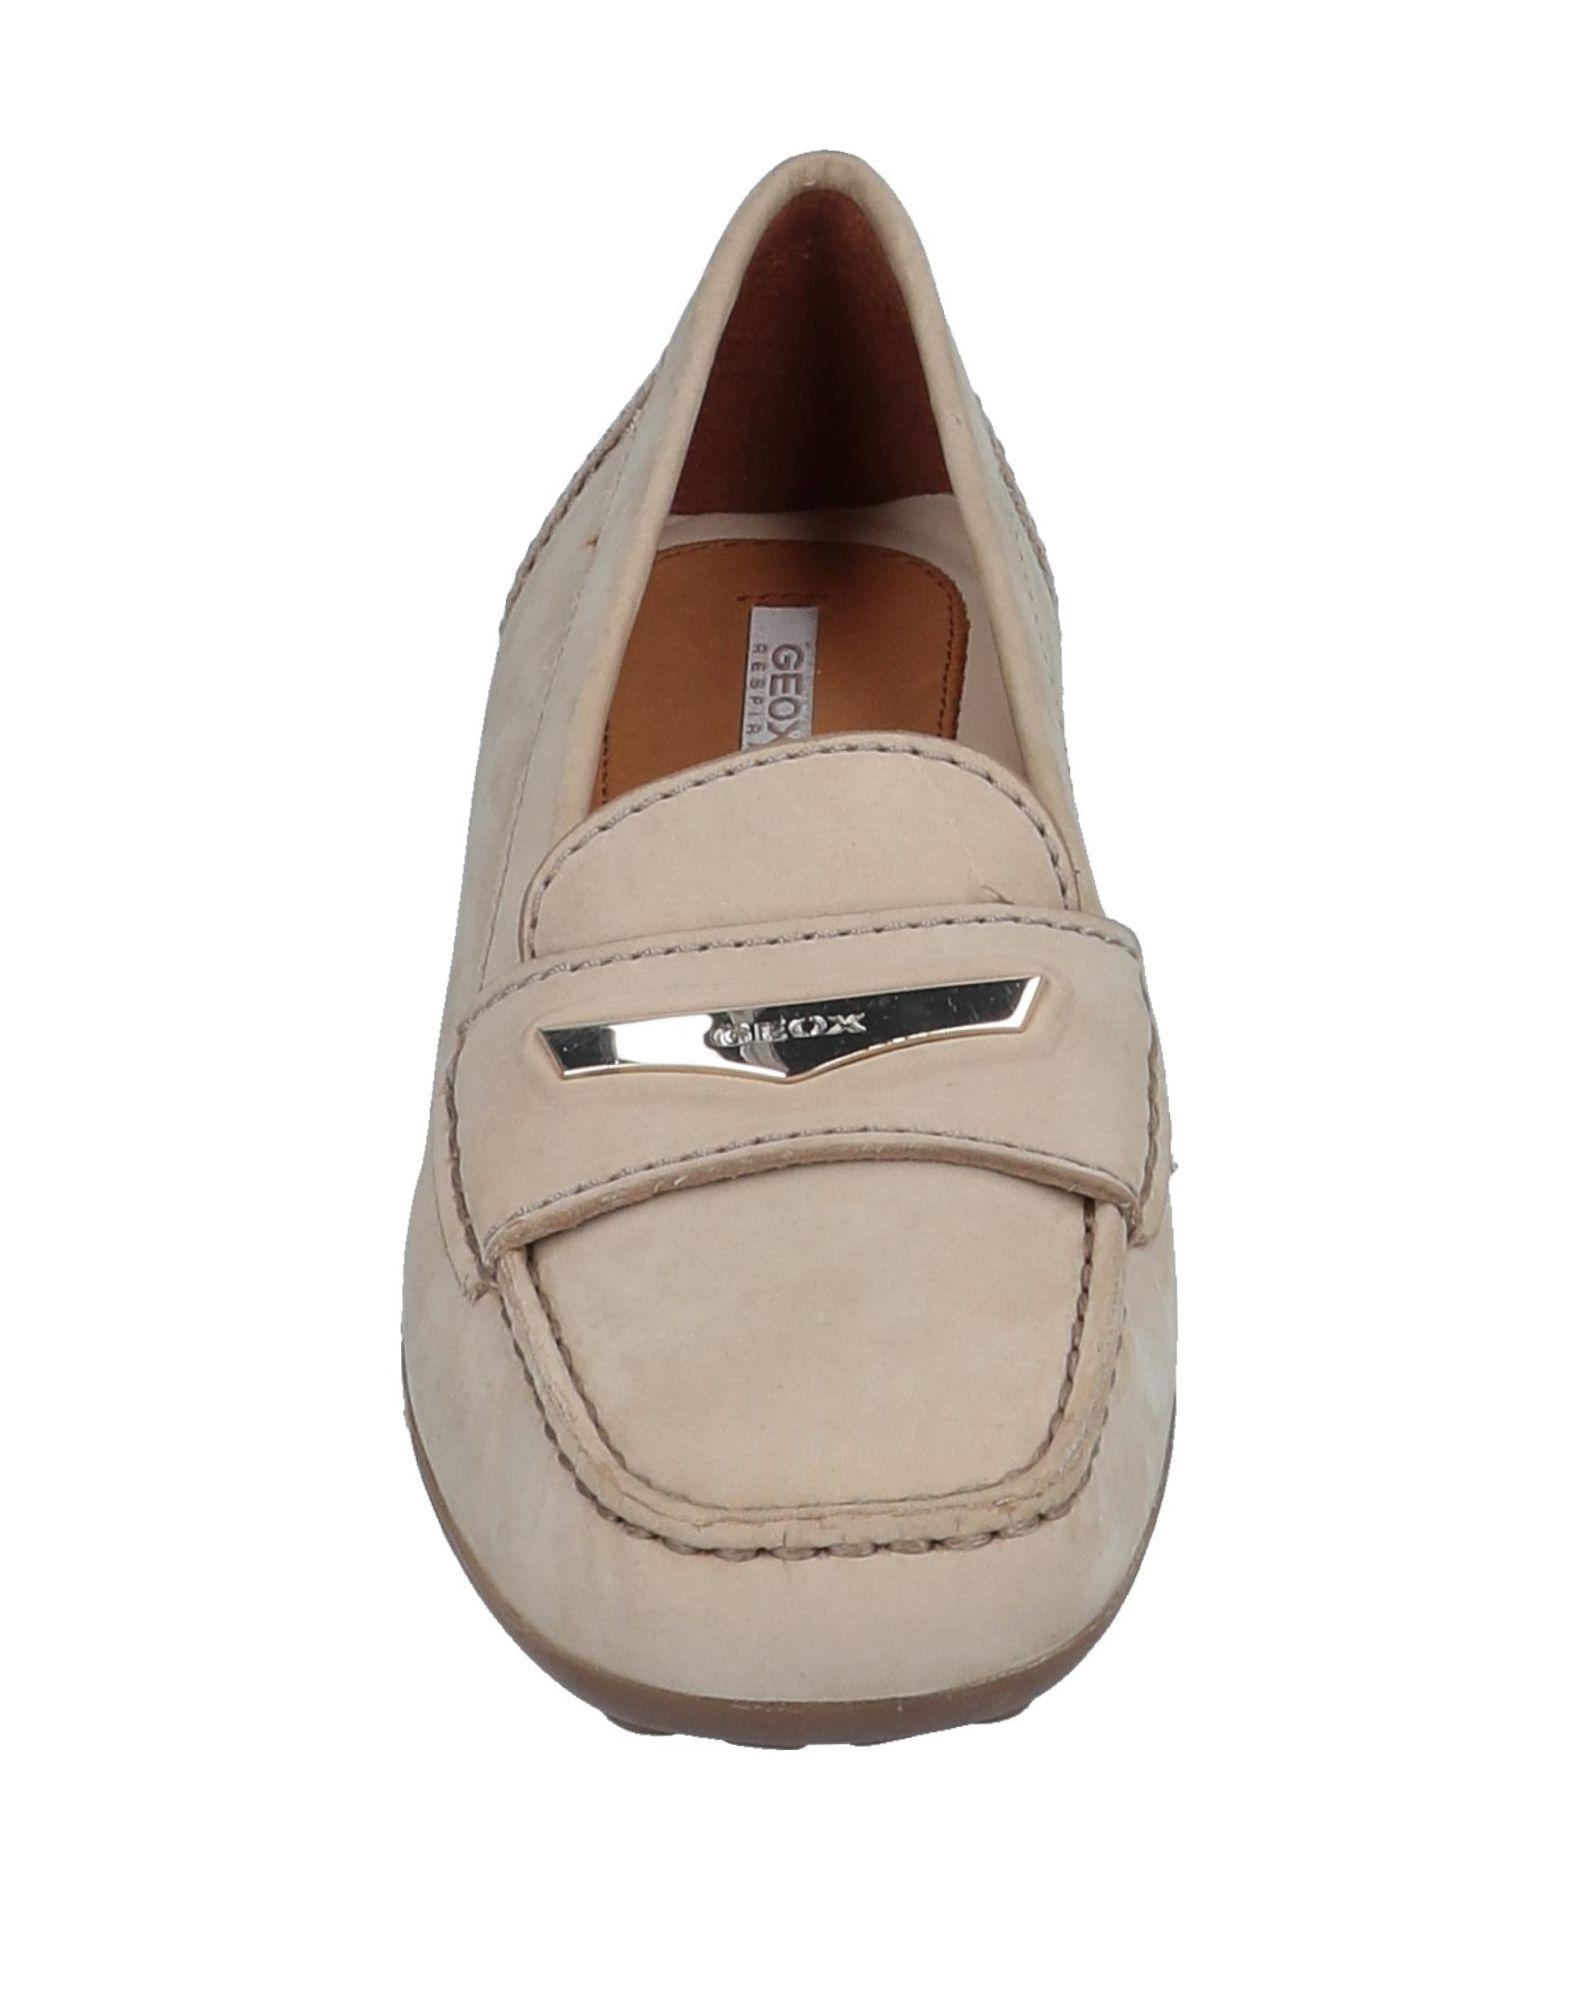 Geox 11552970AE Mokassins Damen  11552970AE Geox Gute Qualität beliebte Schuhe 2b1e8a